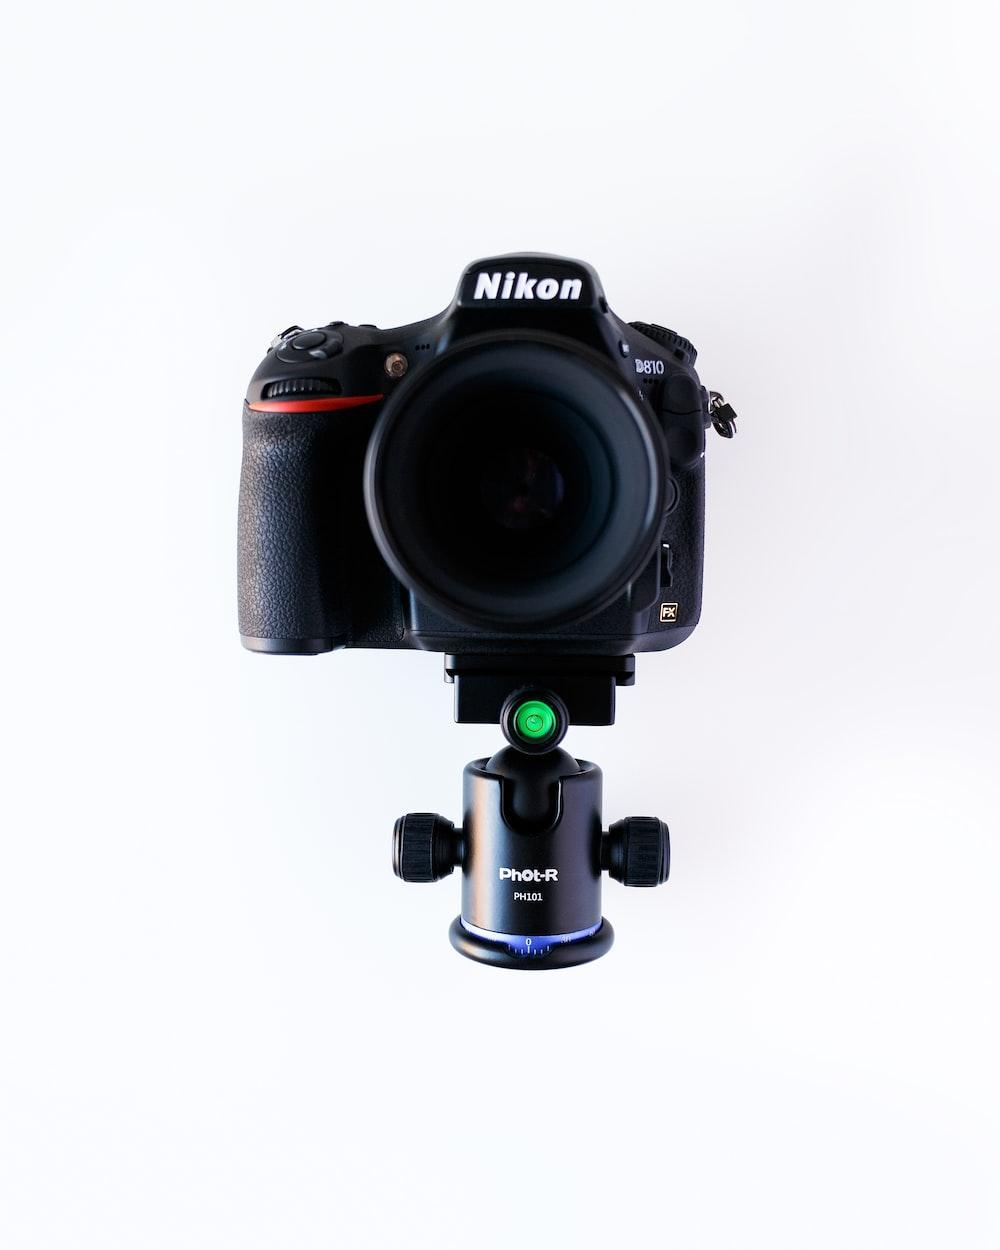 black Nikon DSLR camera with lens